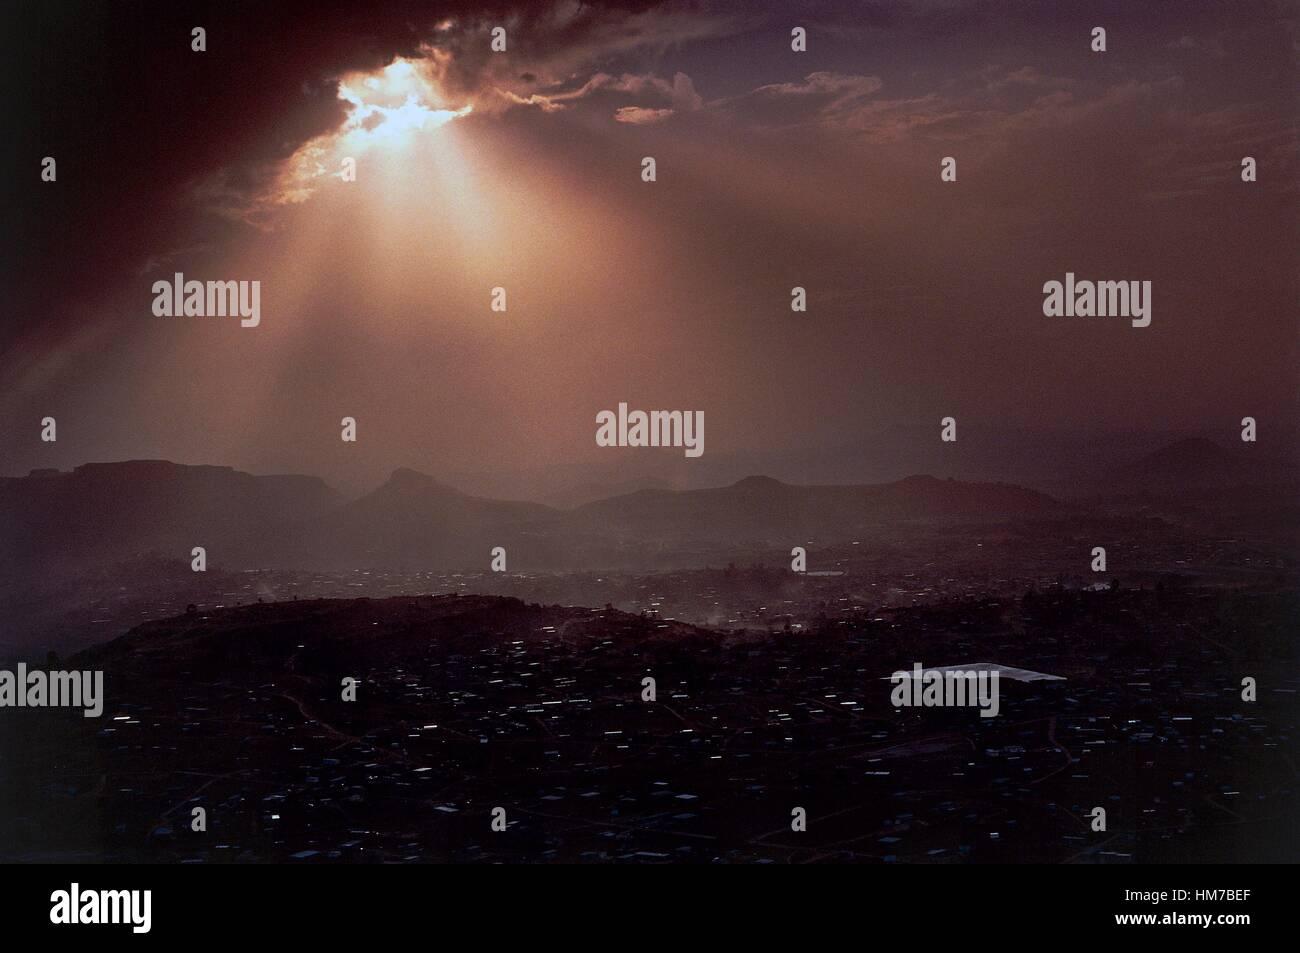 Maseru plain from Lancers Gap, effects of light, Lesotho. - Stock Image